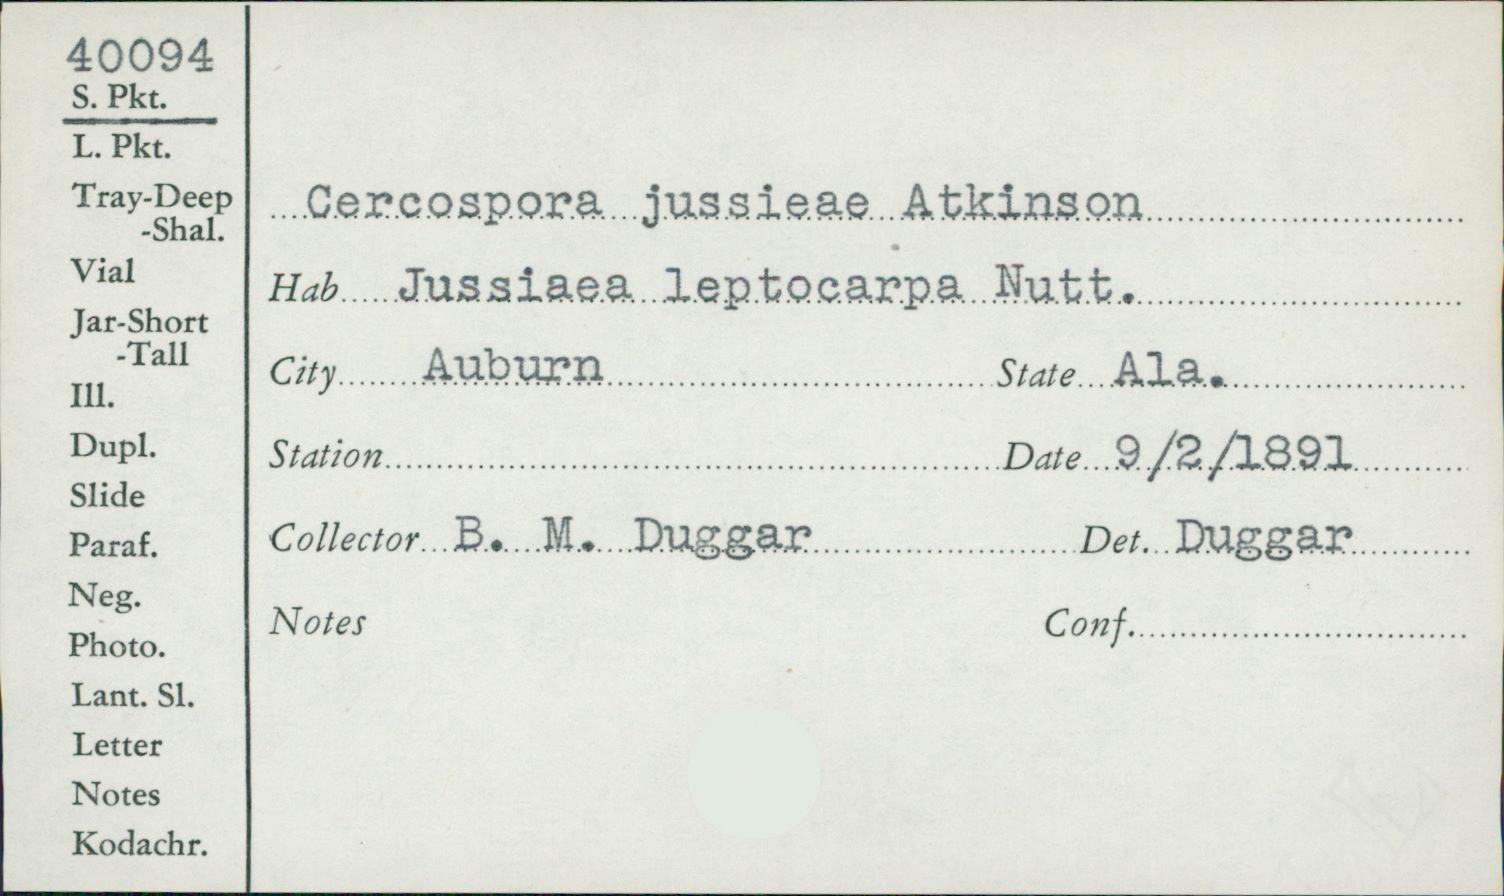 Pseudocercospora jussiaeae image